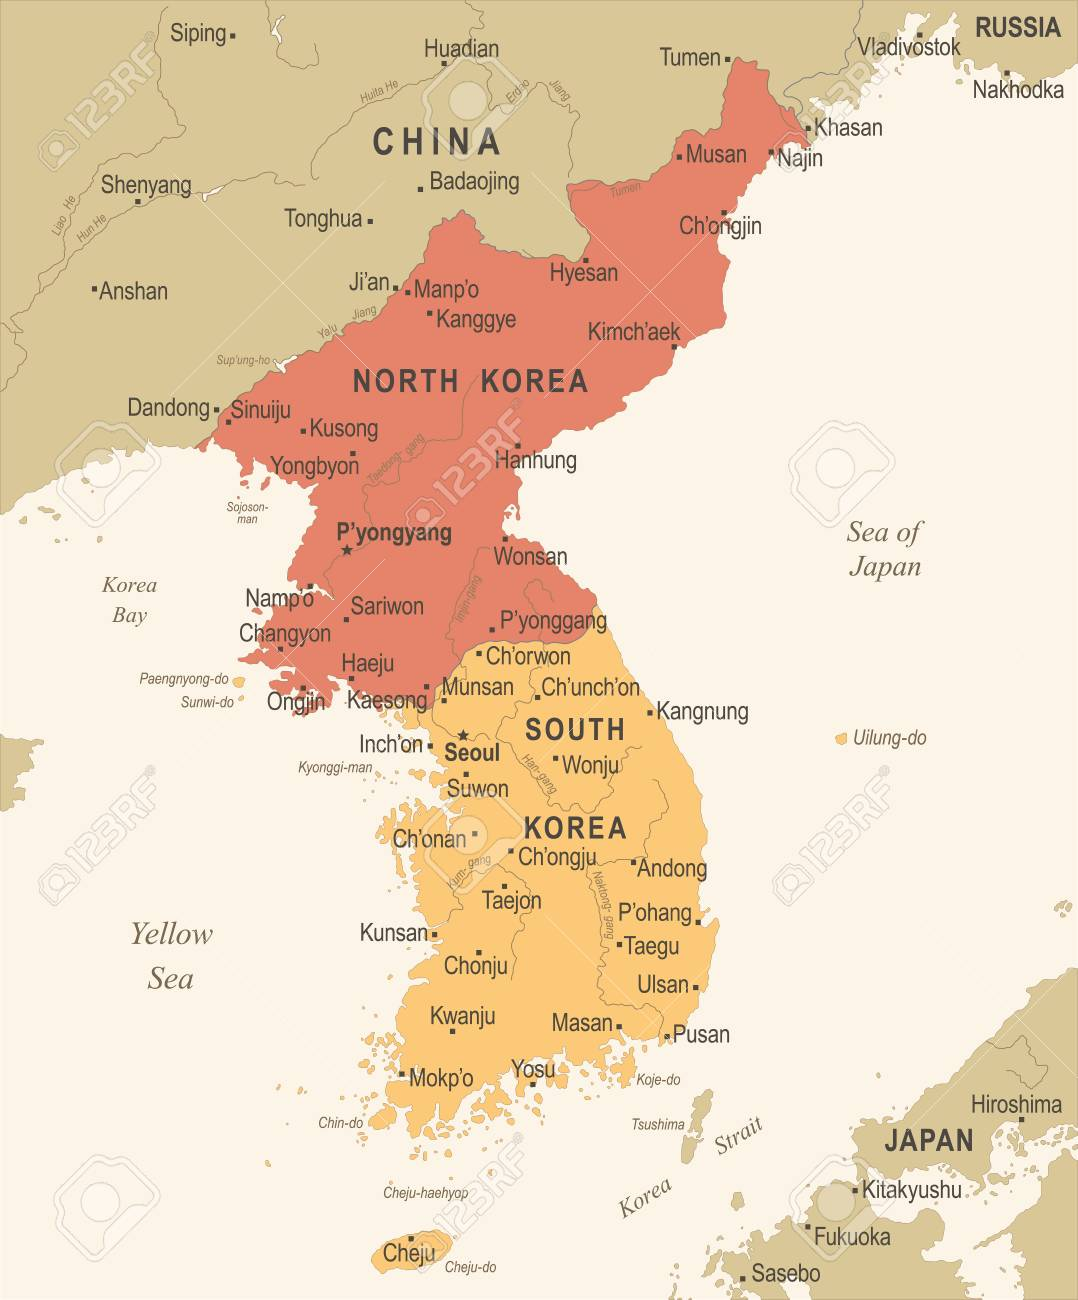 Korean Peninsula Map - Vintage Detailed Vector Illustration Royalty Free  Cliparts, Vectors, And Stock Illustration. Image 86738151.